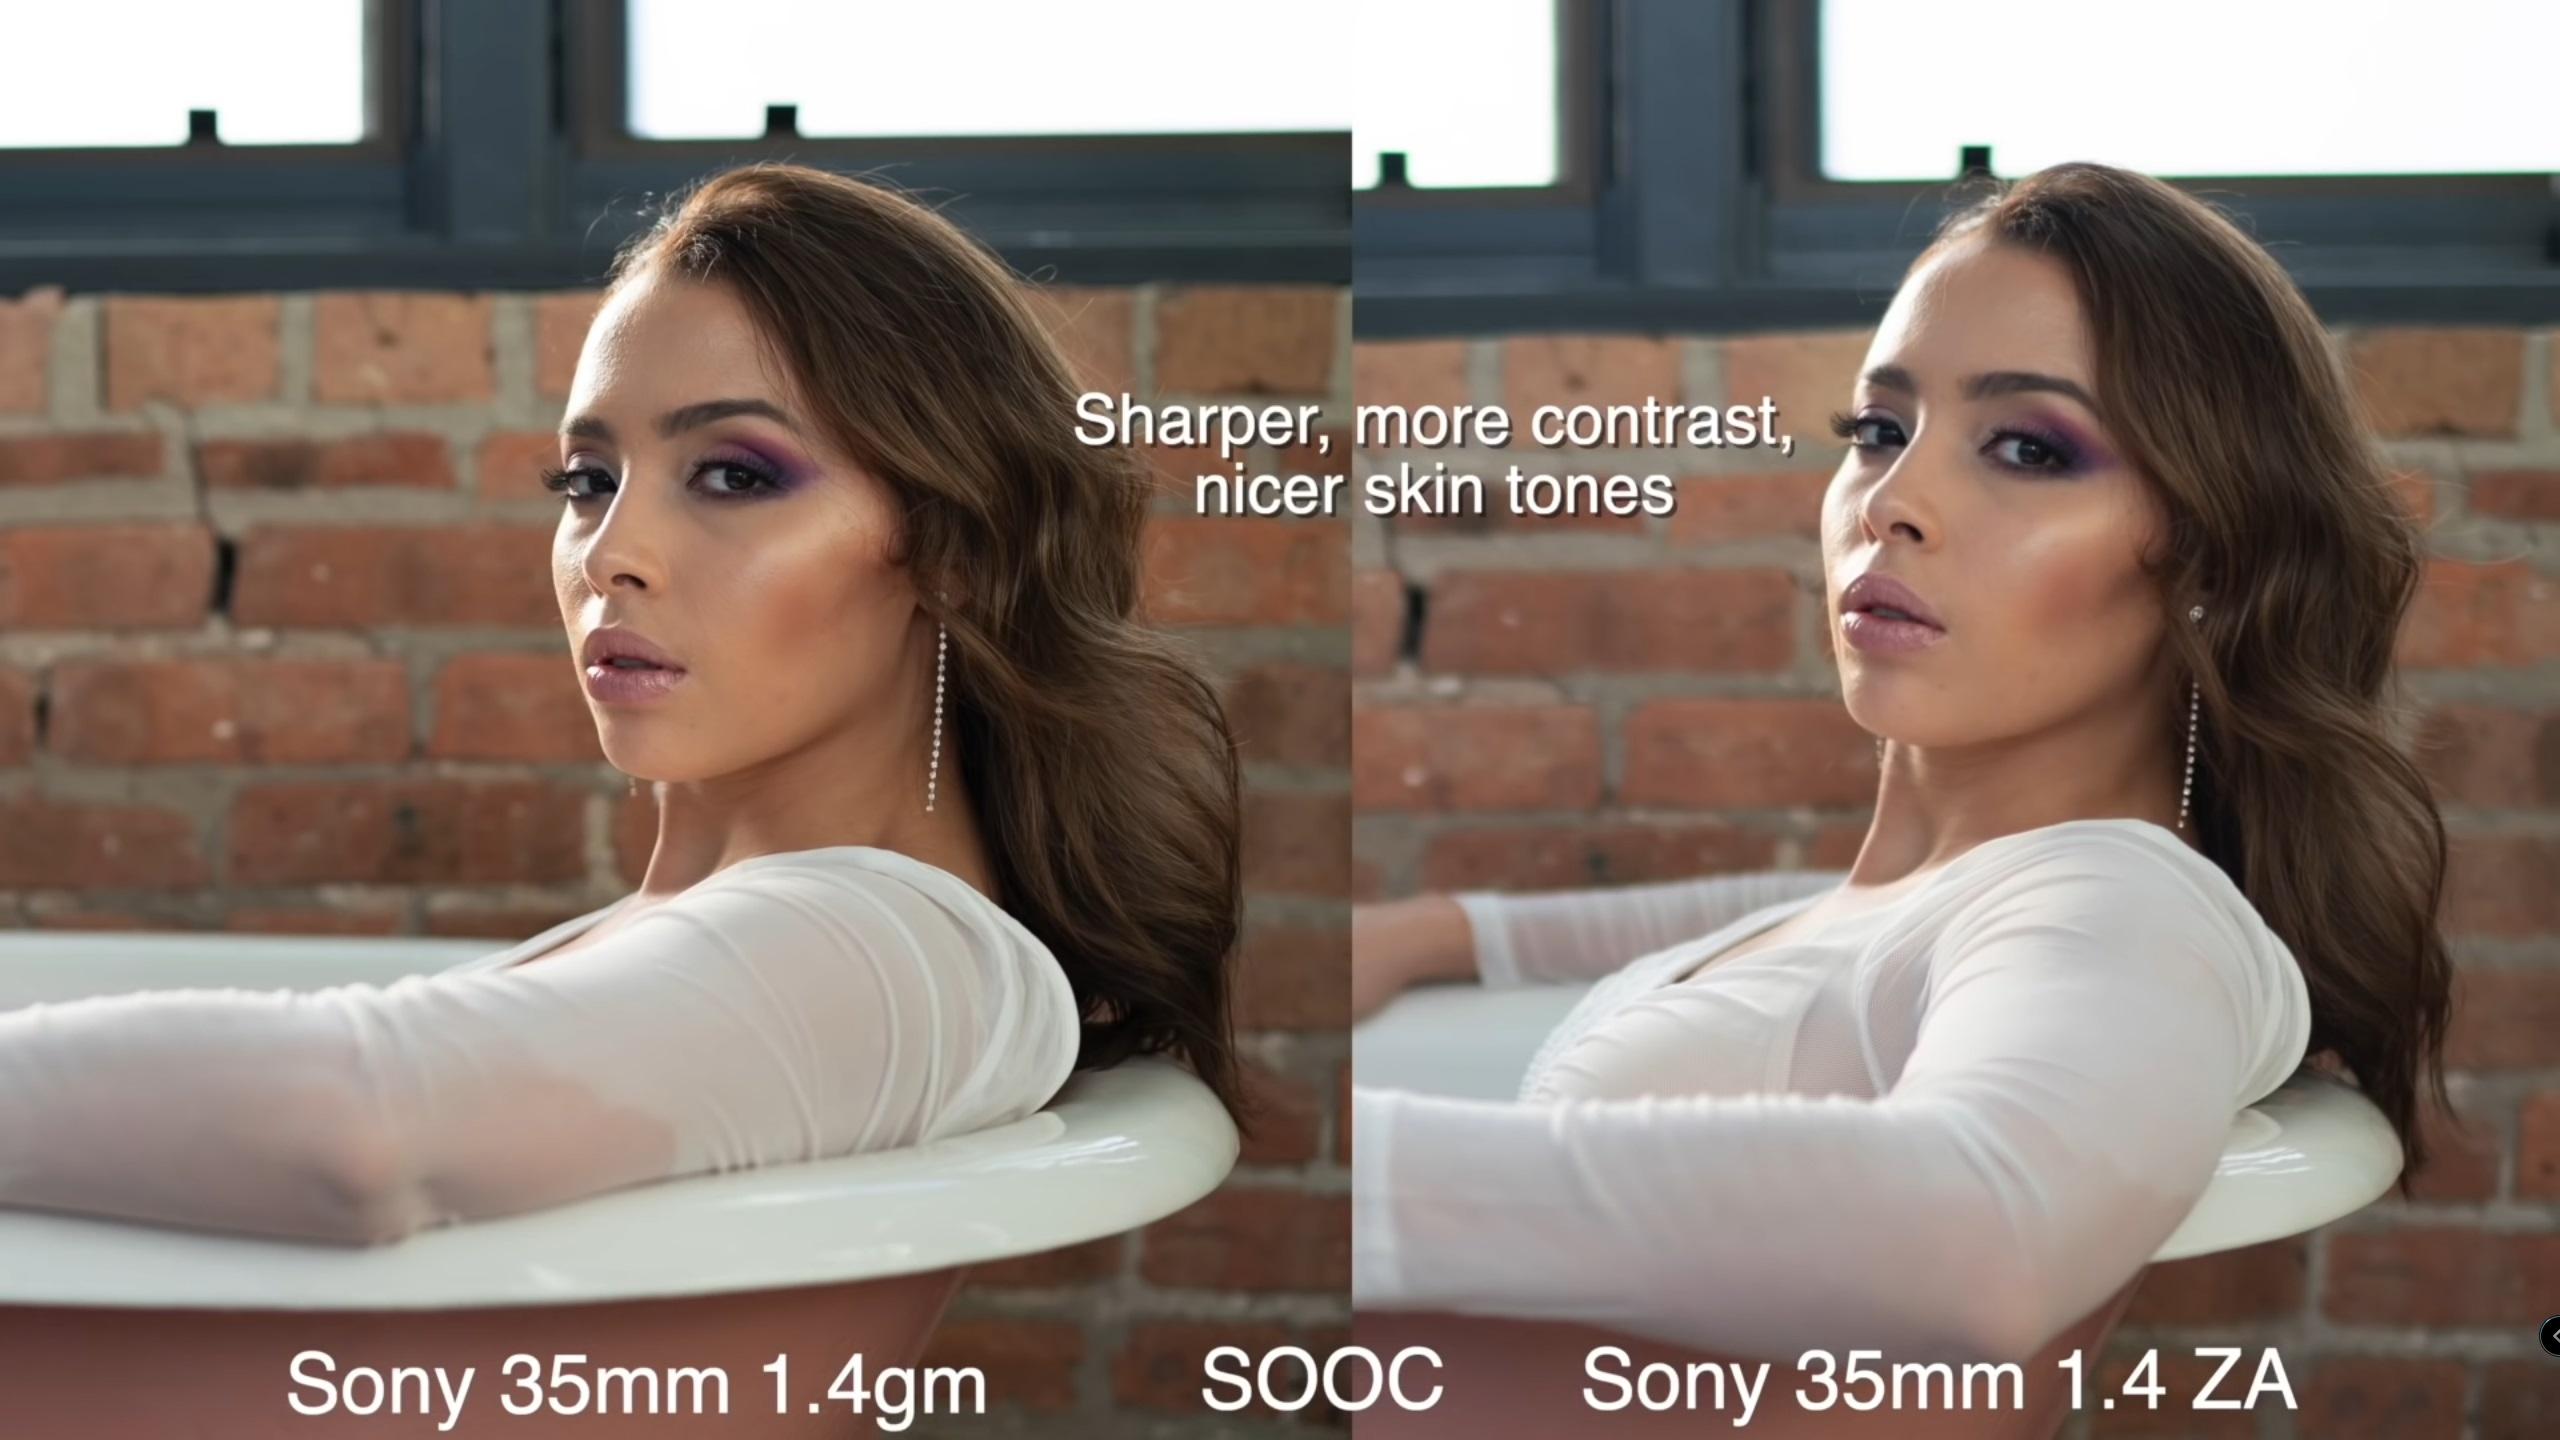 sony-fe-35mm-f1.4-g-master-vs-zeiss-35mm-f1.4